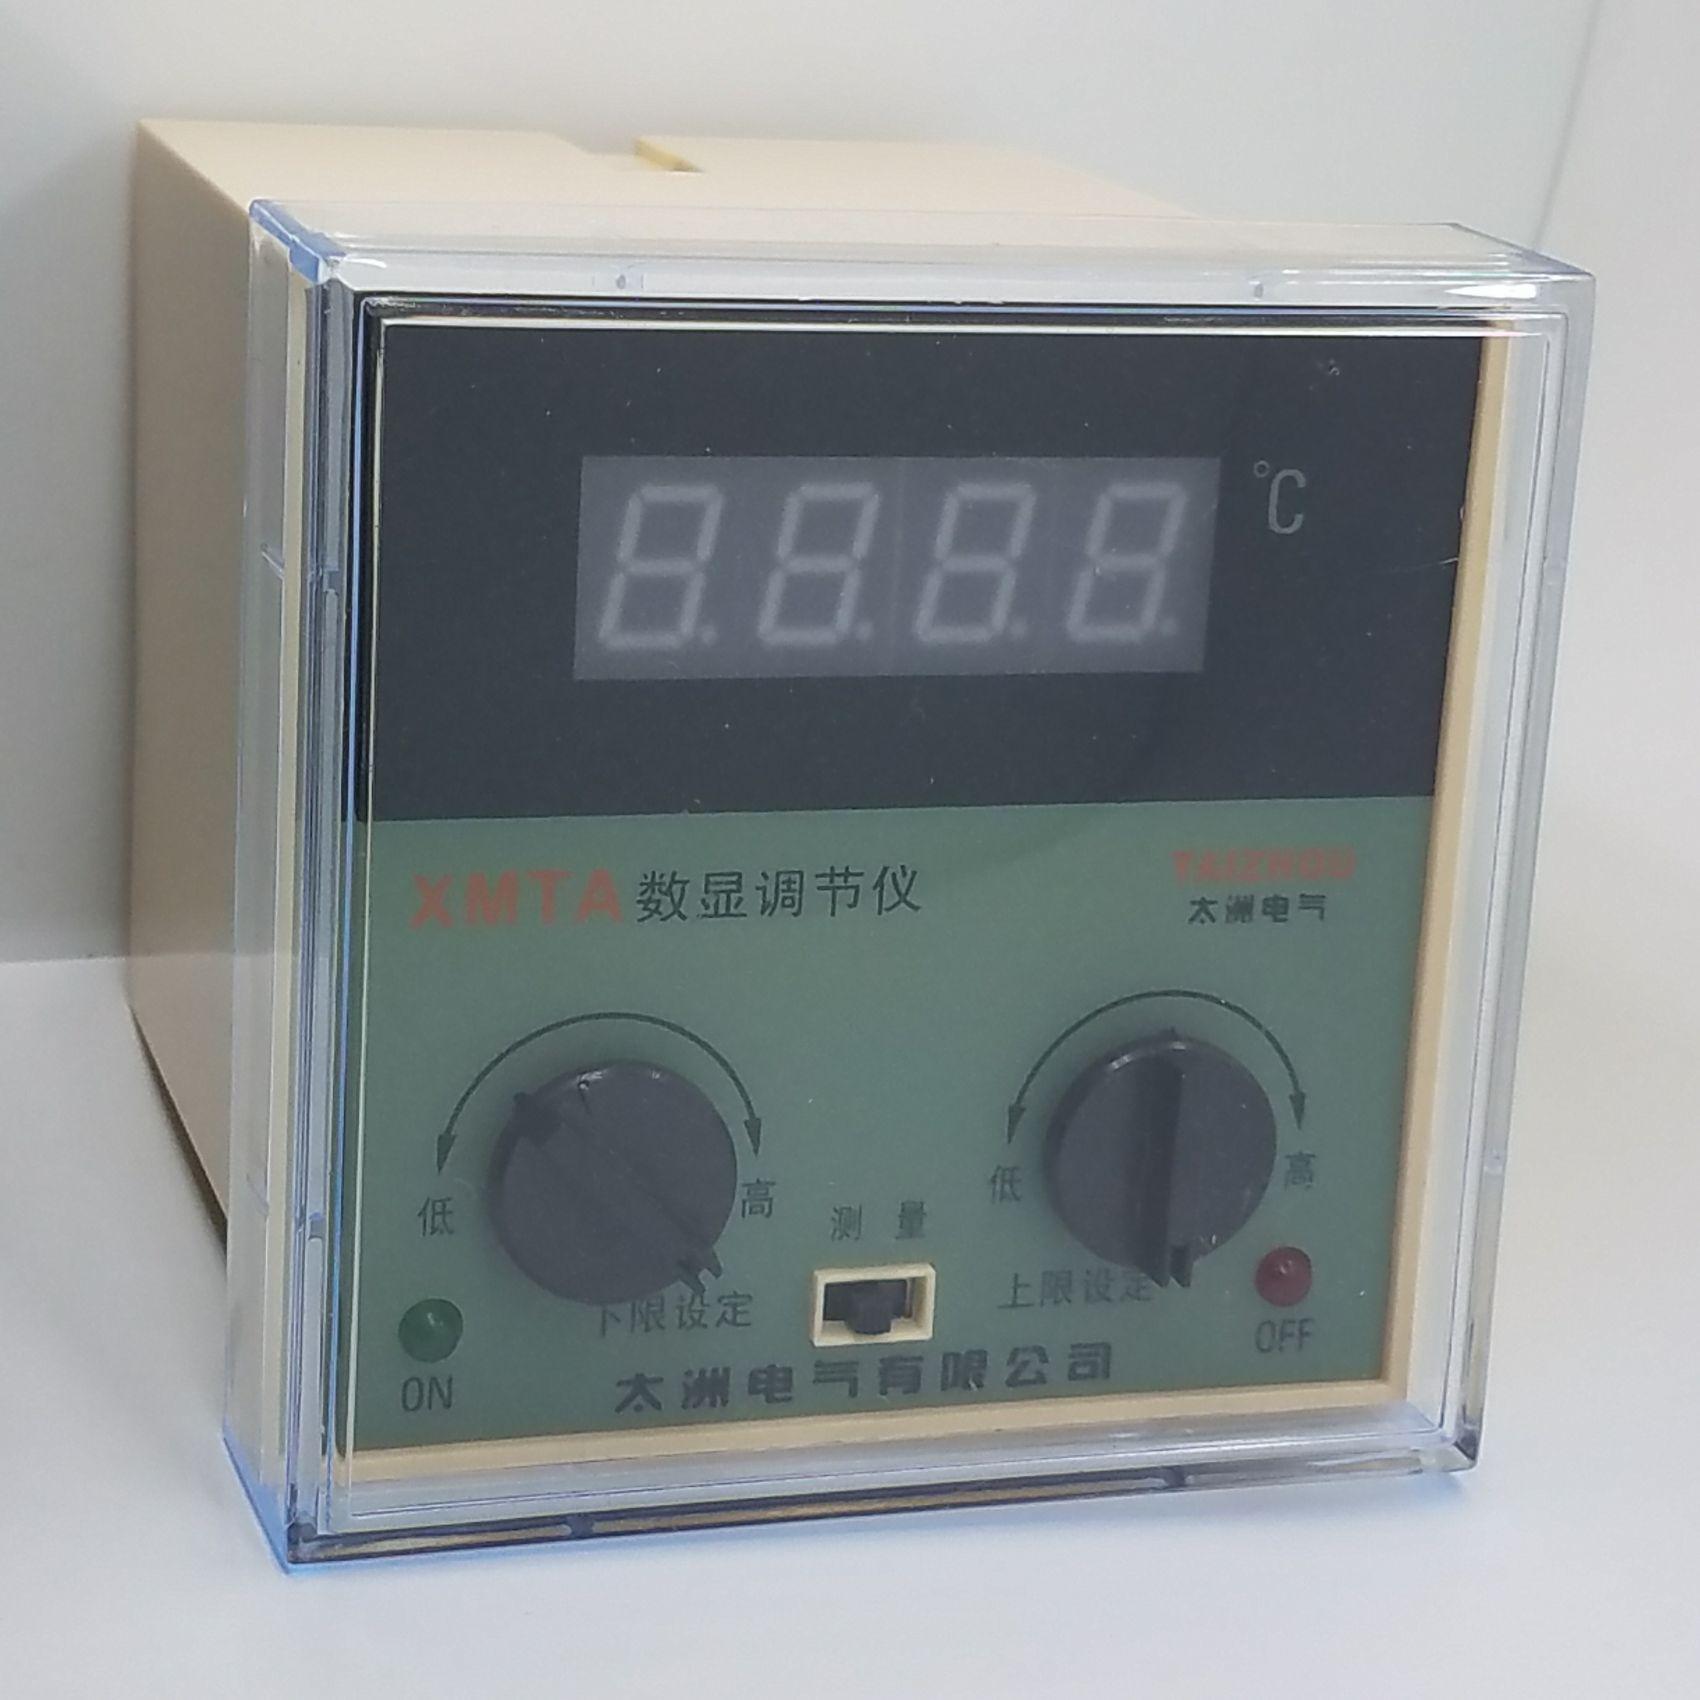 TAIZHOU Electrical Appliance Meter Digital Electronic Temperature Controller relay XMTA-2001M K E 0-400 0-1300 XMT SeriesOven-5P